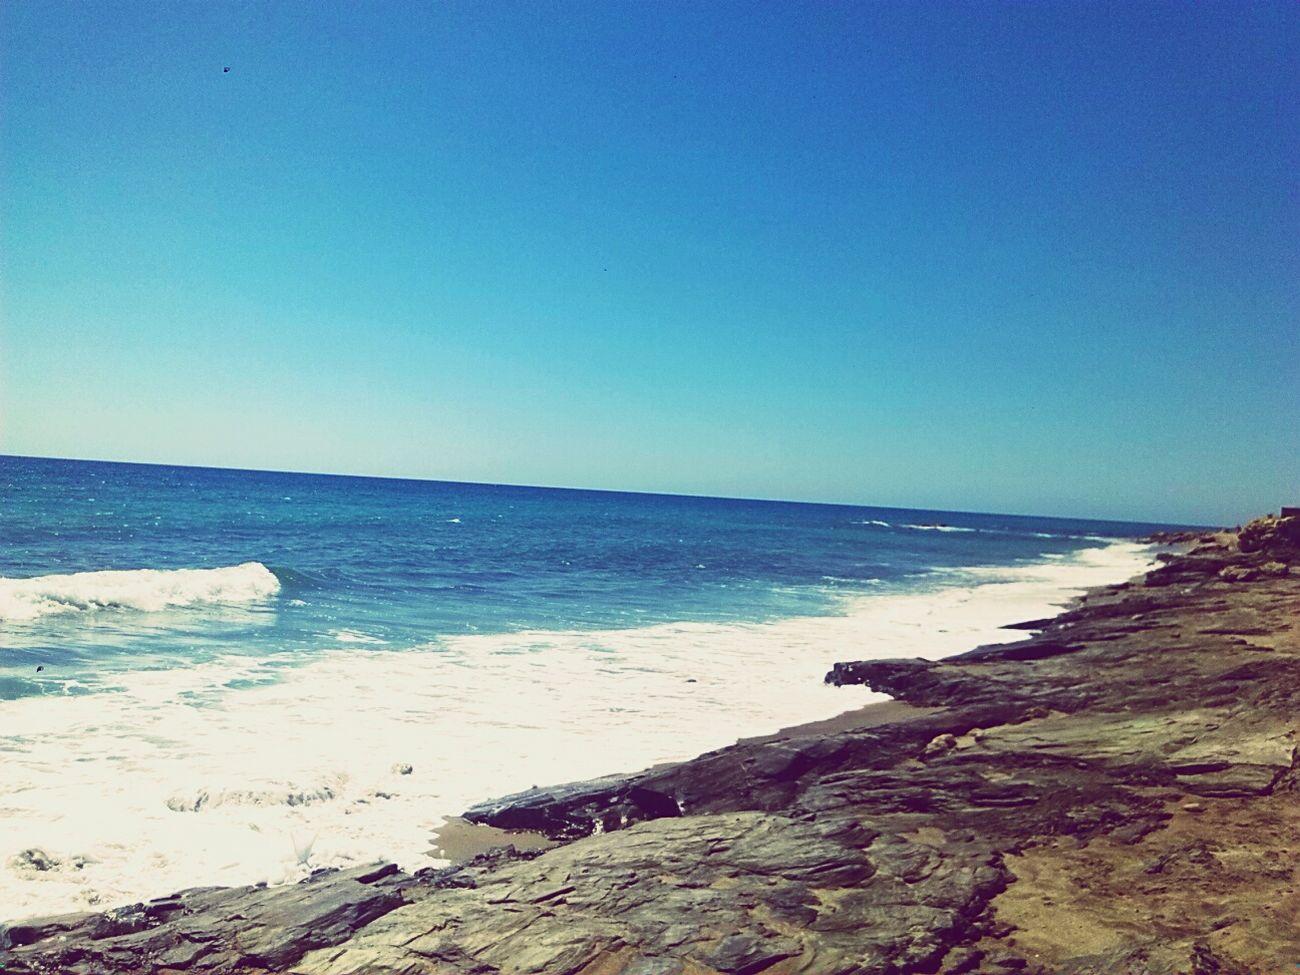 Mojacar playa Playa Beachphotography Beach Photography Rocas Y Mar Nature Nature_perfection Beautiful Nature Nature_collection Pedresdemar Piedras